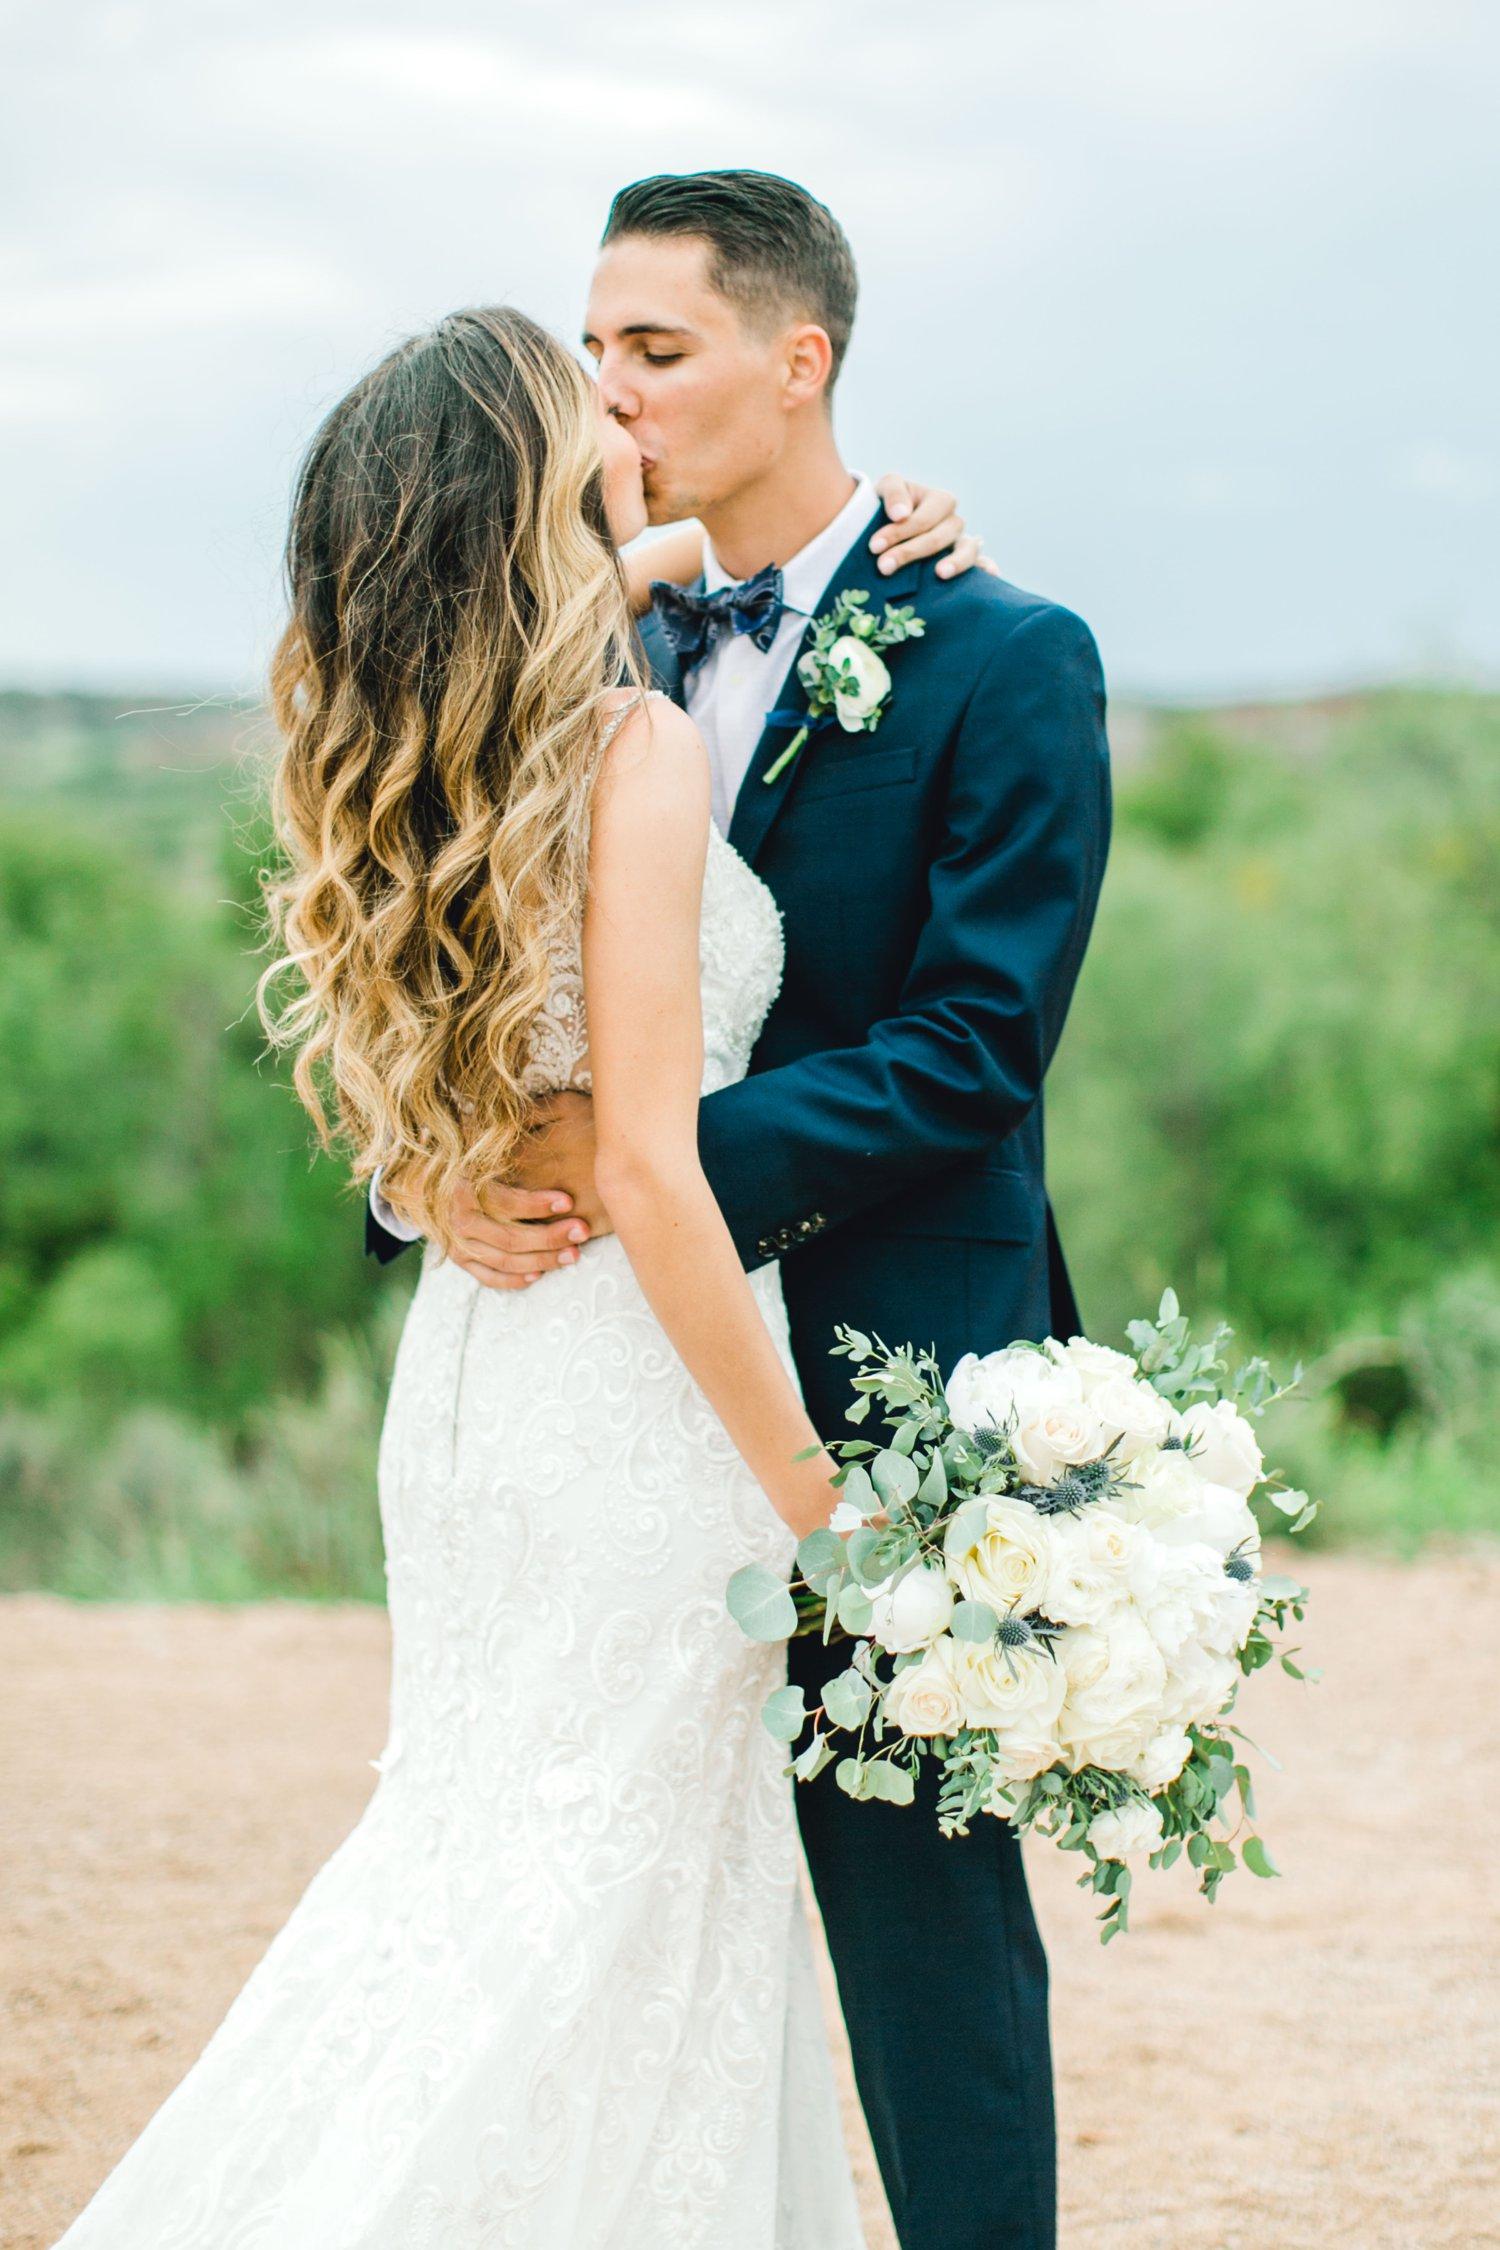 Ashley_John_English_Elegant_Texas_Wedding_Outdoors_Ranch_Caprock_Winery_ALLEEJ_0066.jpg